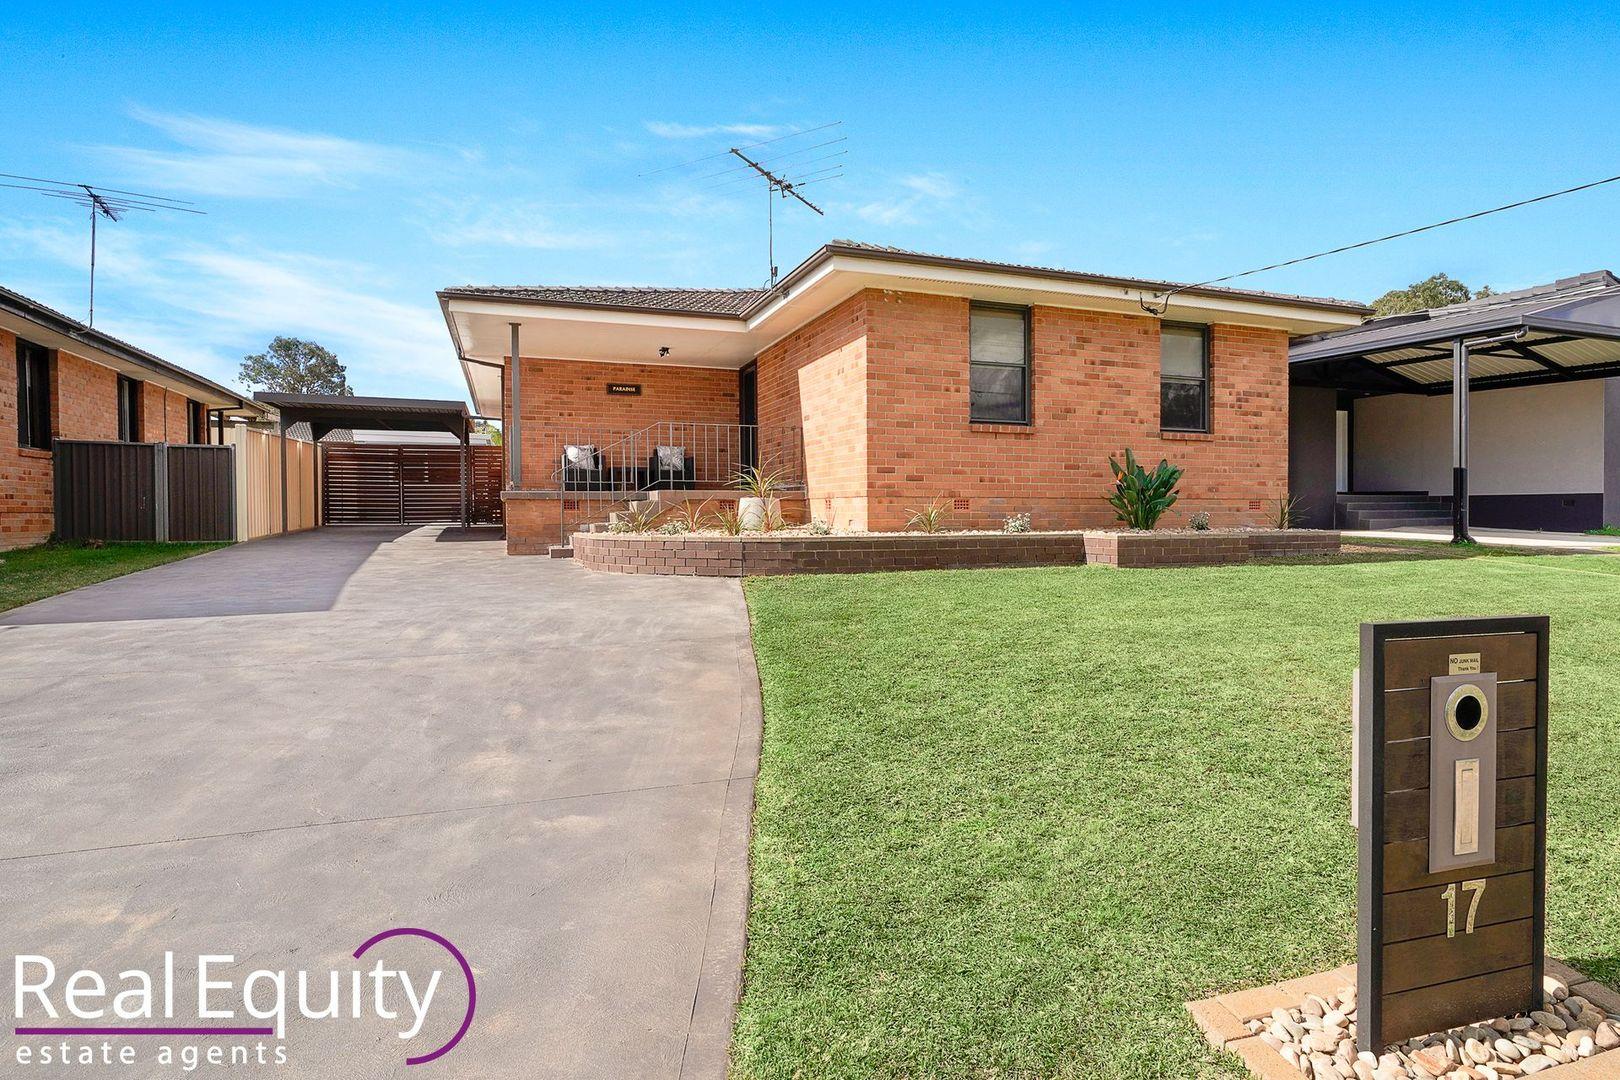 17 Meehan Avenue, Hammondville NSW 2170, Image 0